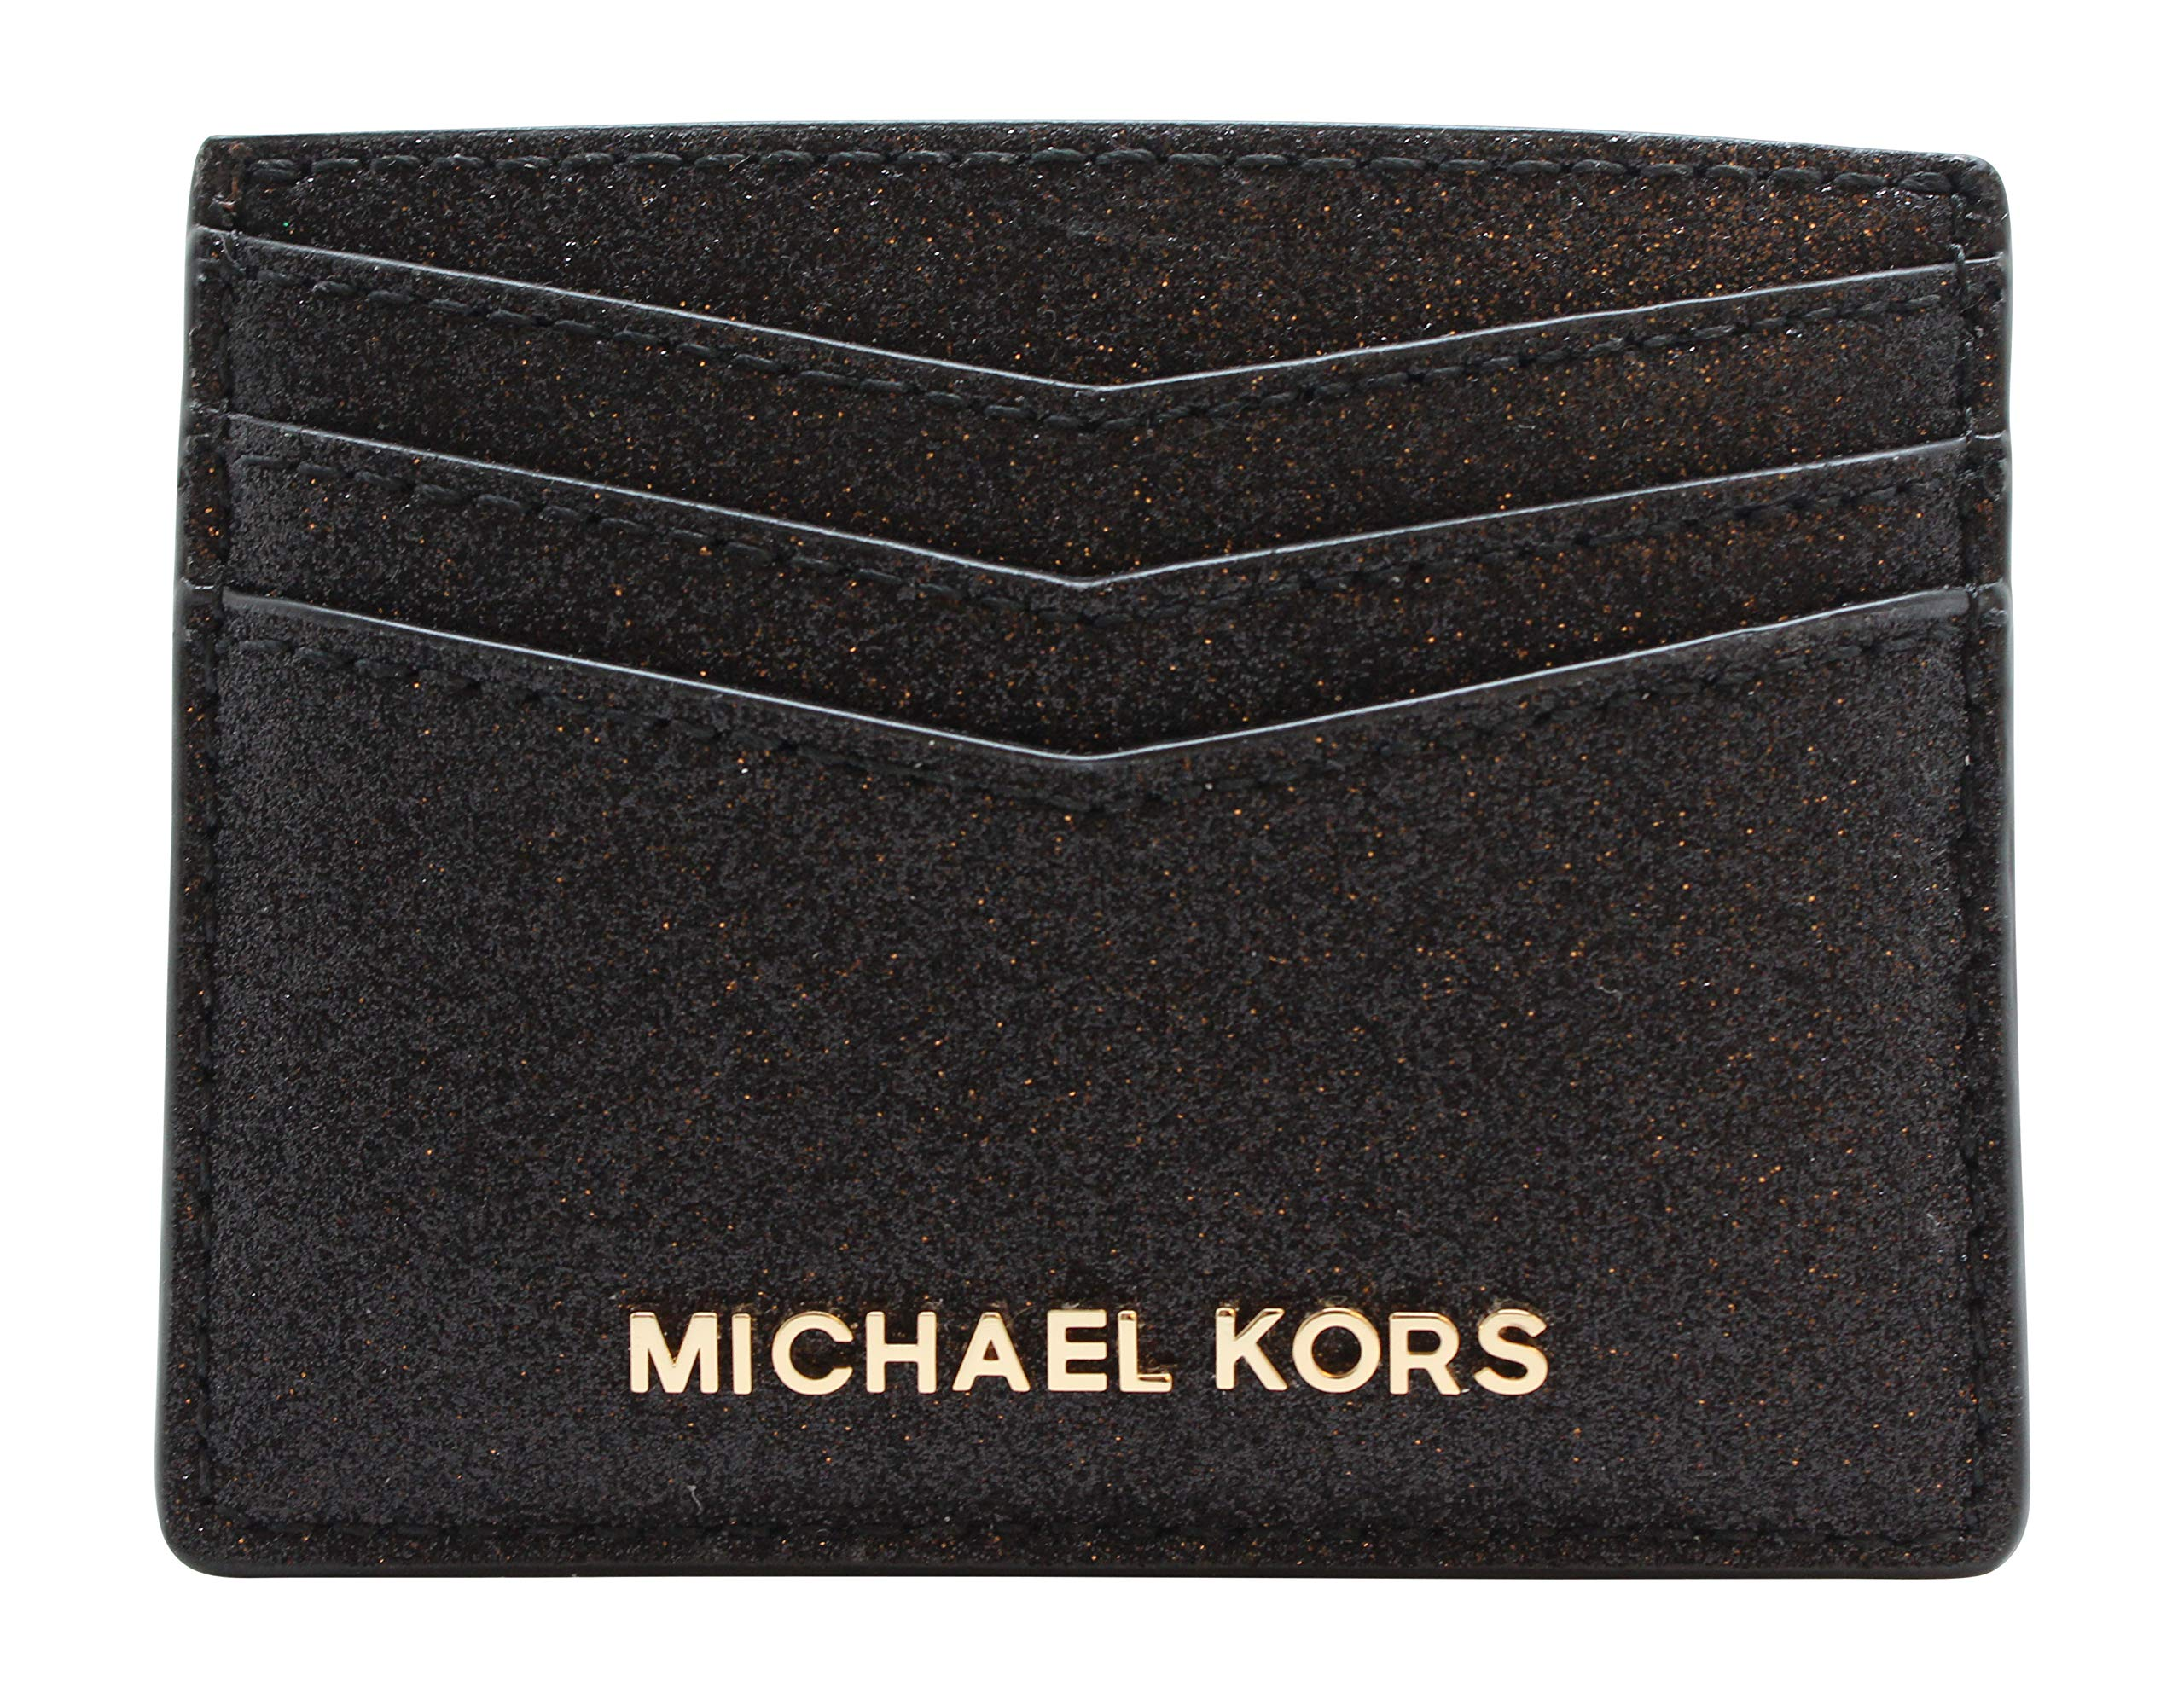 Michael Kors Giftables Large Card Holder Black Glitter by Michael Kors (Image #1)